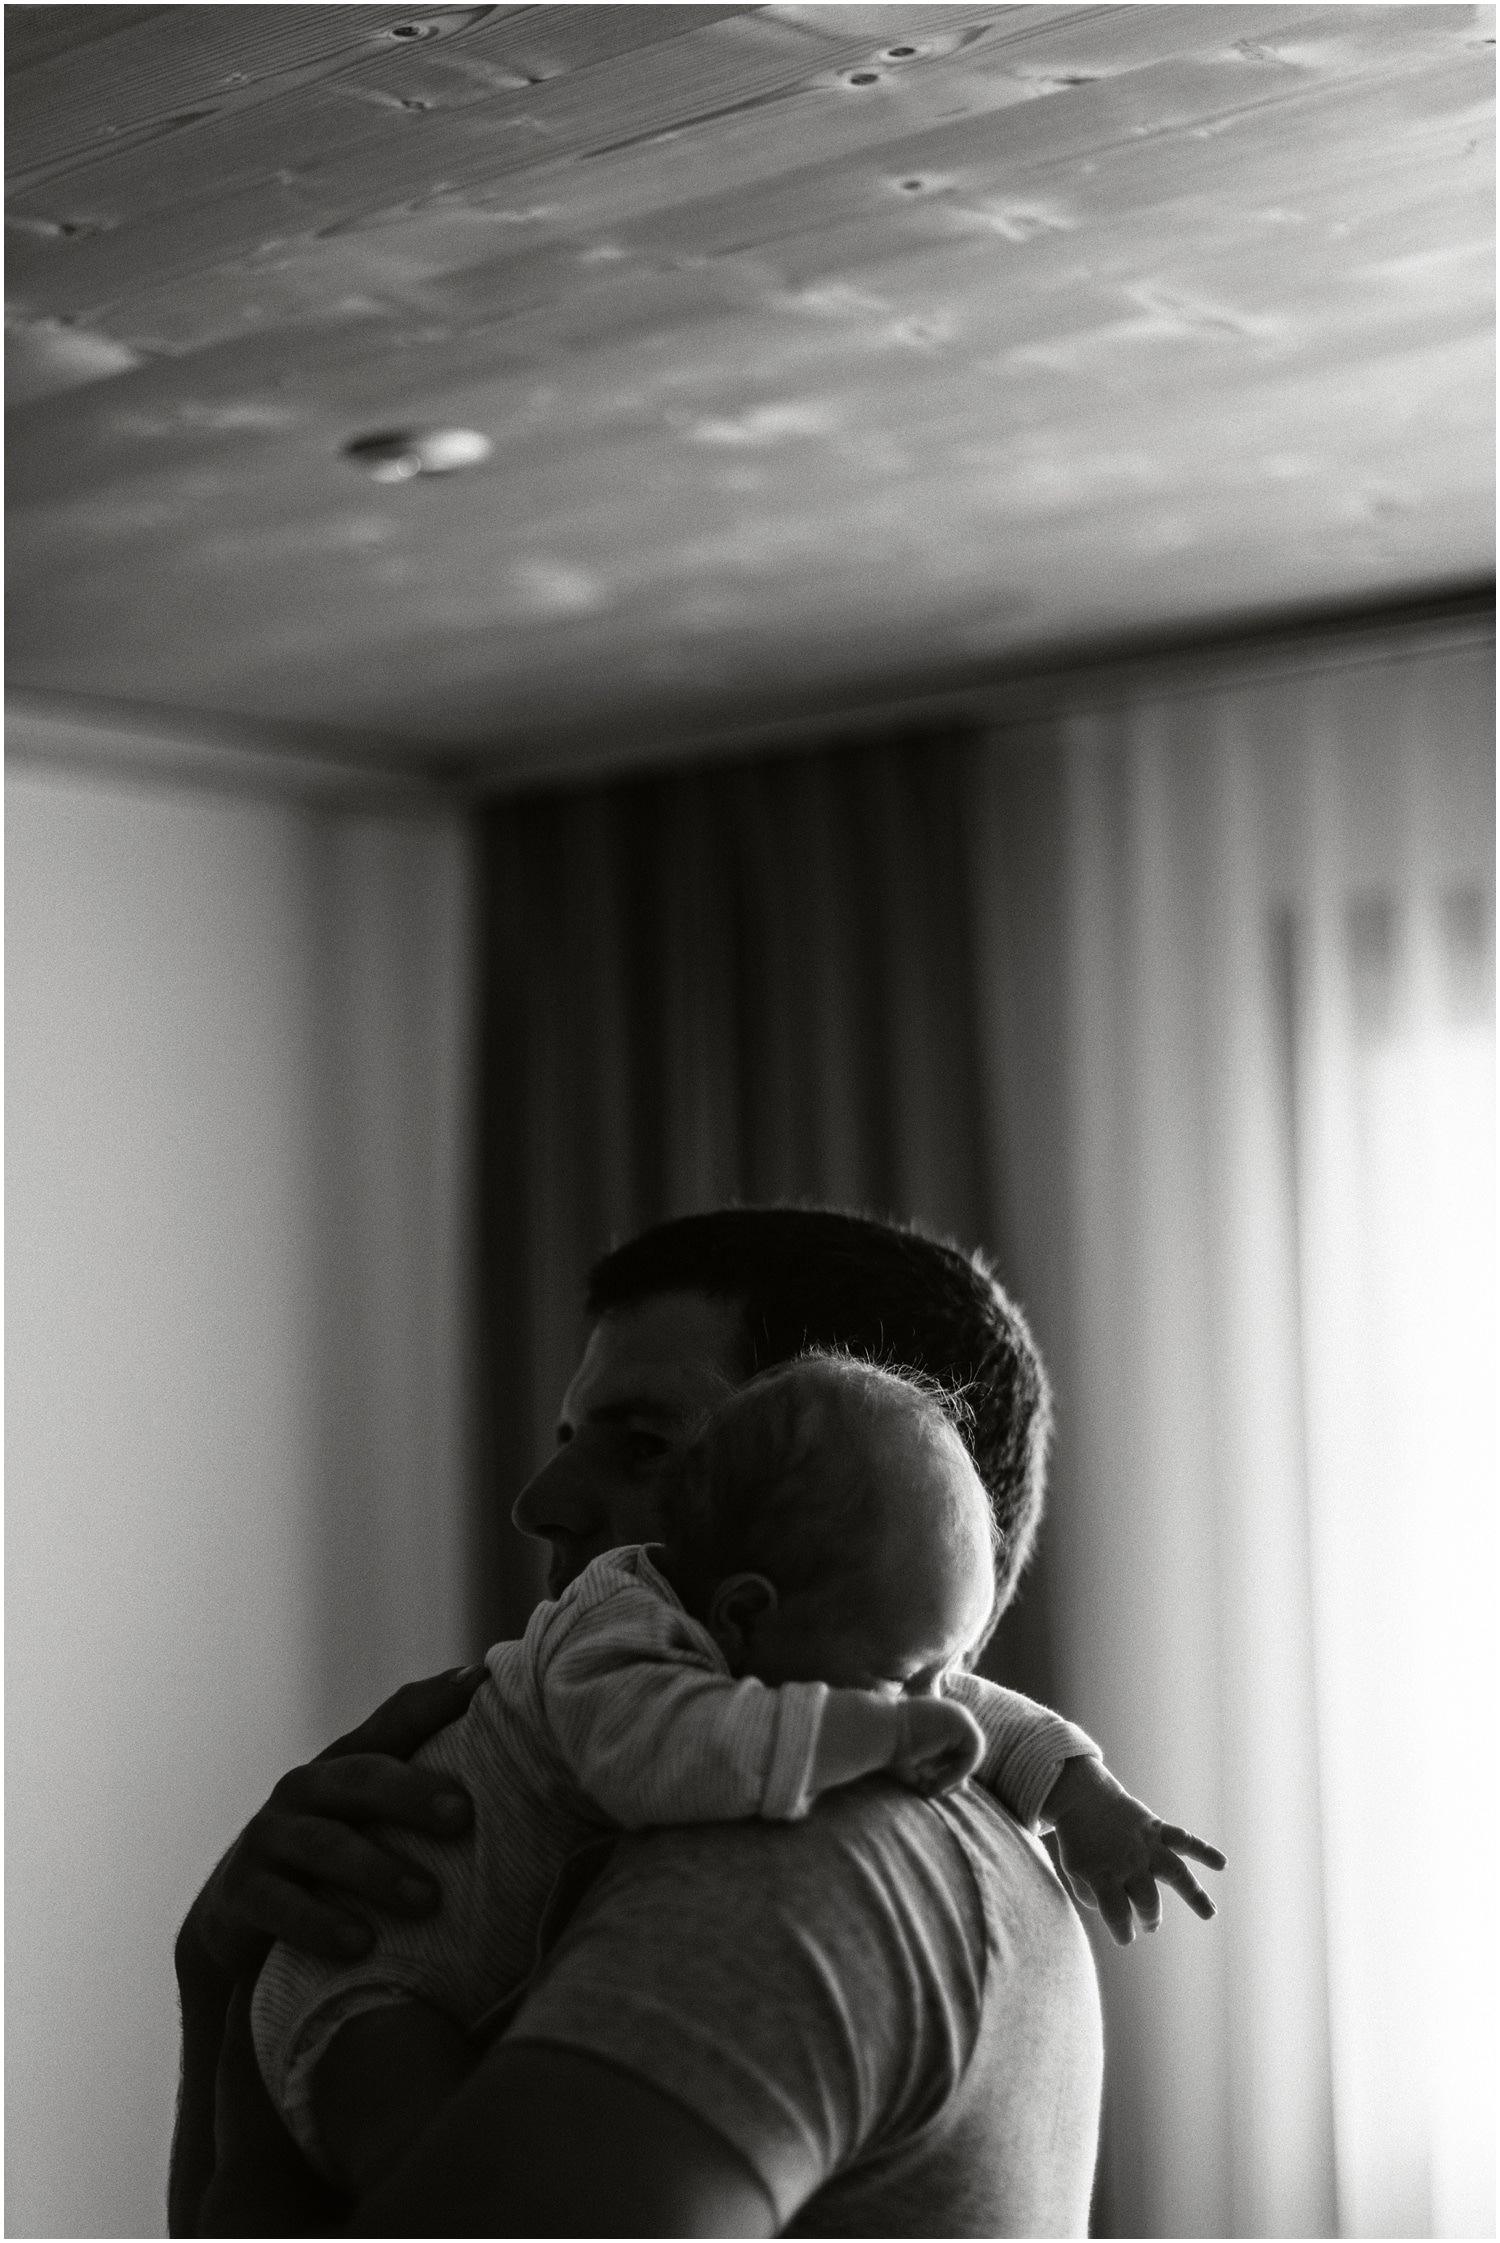 Lifestyle Newborn, Newborn Reportage, Newborn zuhause, Babyfotografie, Babyfotograf zuhause, Reportage Fotografie, Babyfotos Lifestyle, Babyfotos mal anders